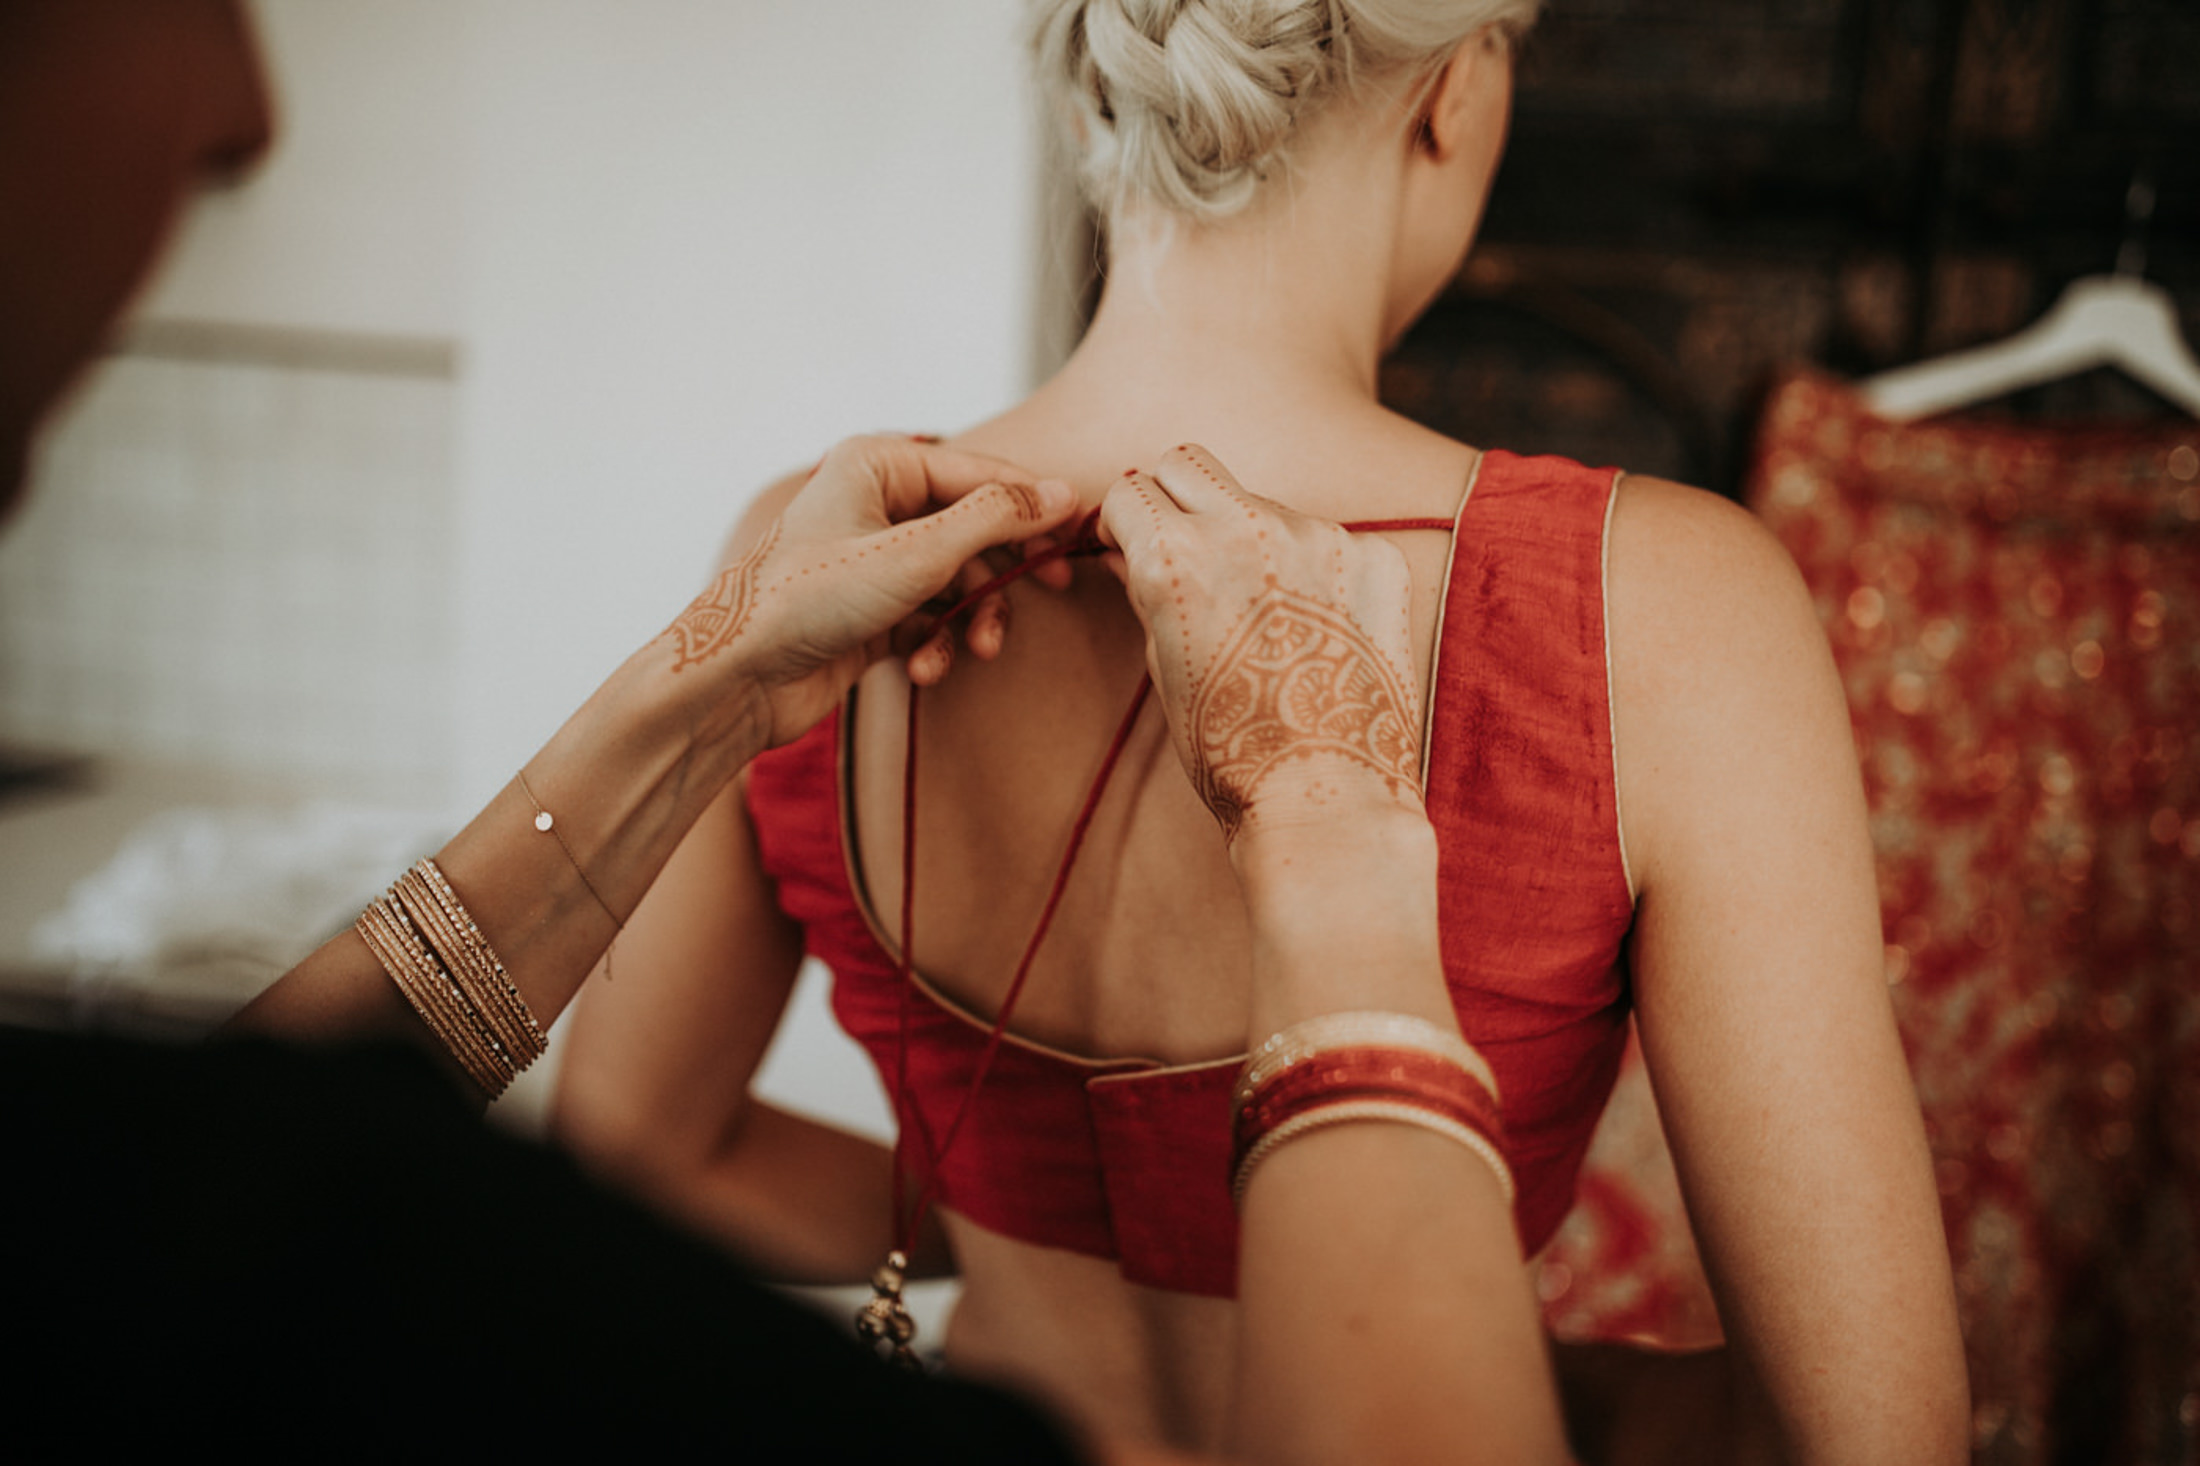 Wedding_Photographer_Mallorca_Daniela-Marquardt_Photography_New_York_Iceland_Tuscany_Santorini_Portugal_Austria_Bavaria_Elopement_Hochzeitsfotograf_AntjeRajat2_9